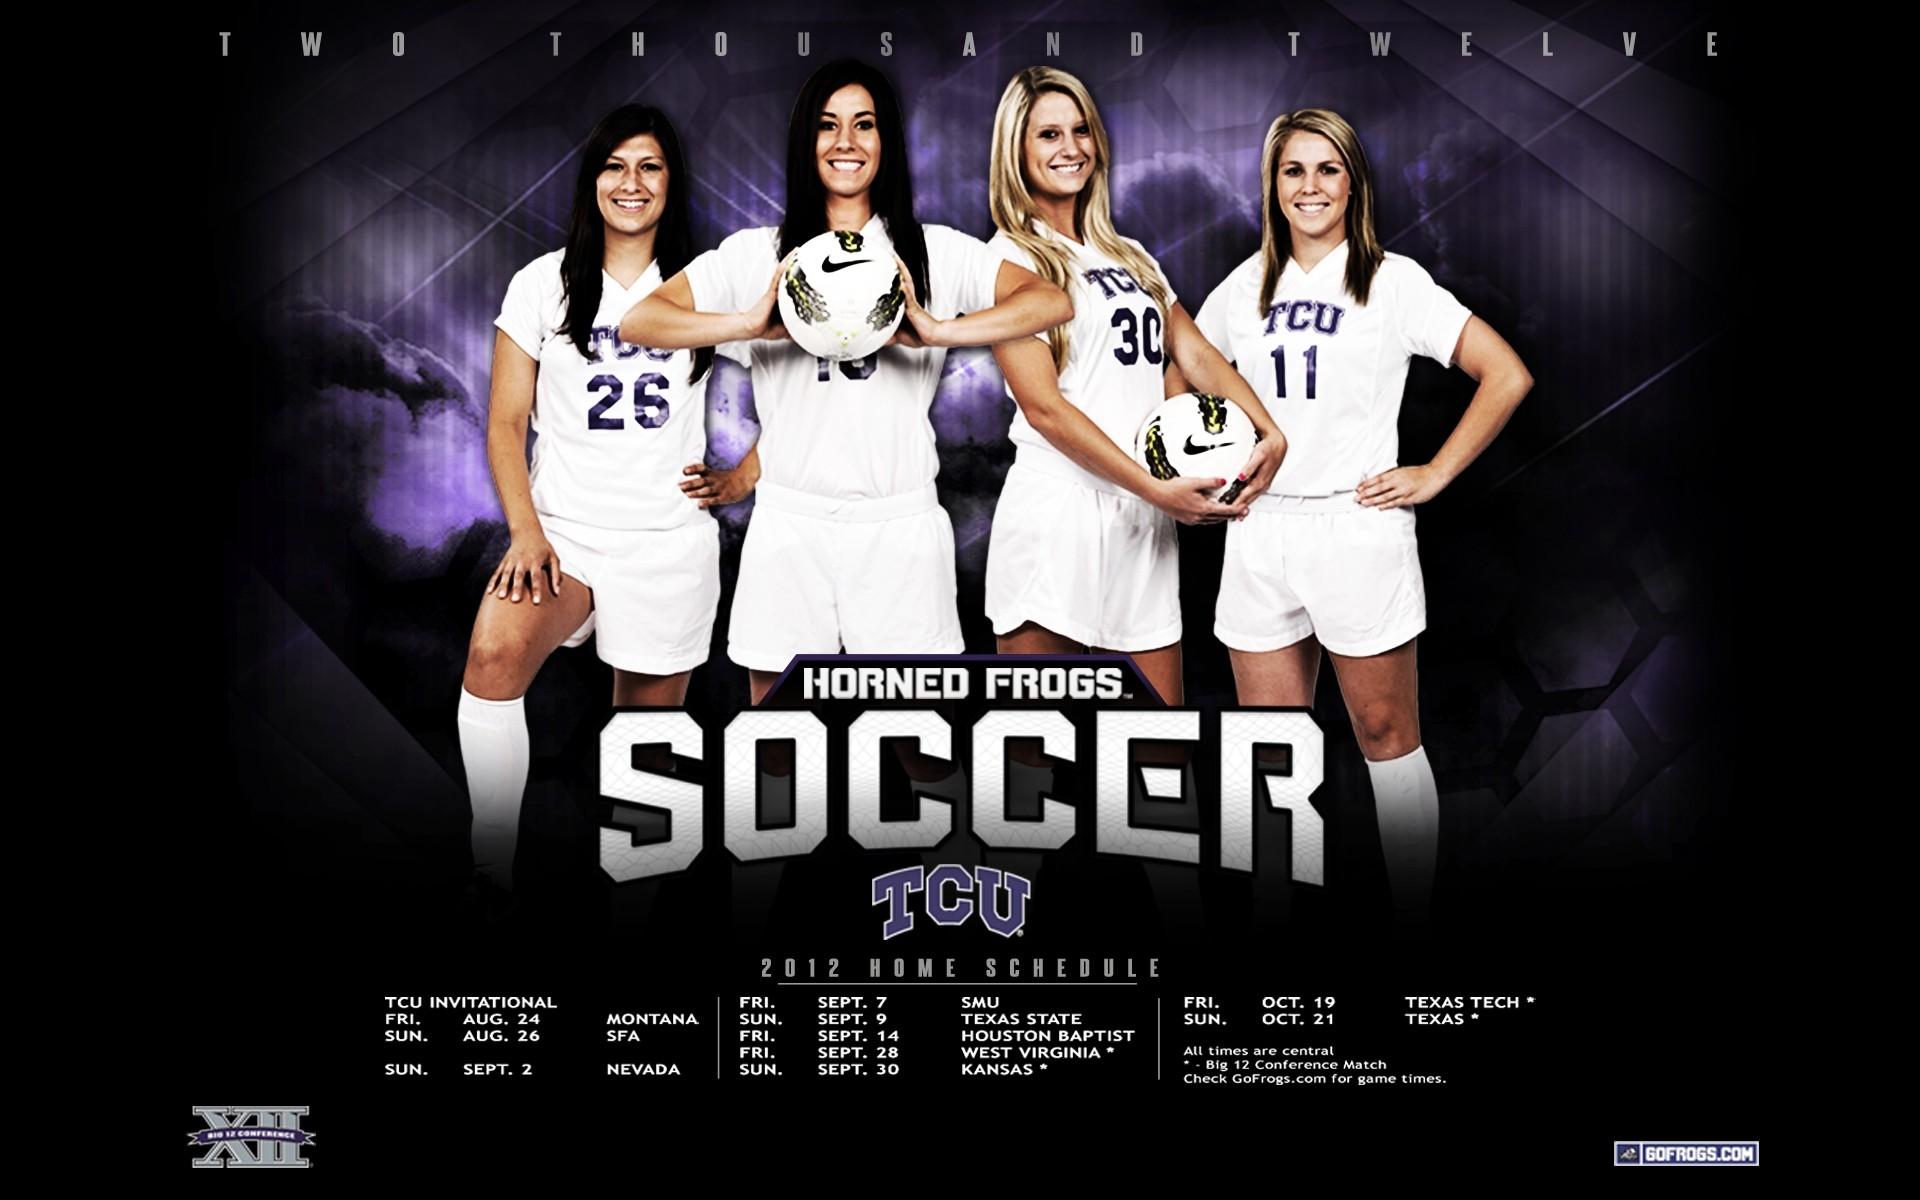 Women's Soccer Desktop Backgrounds